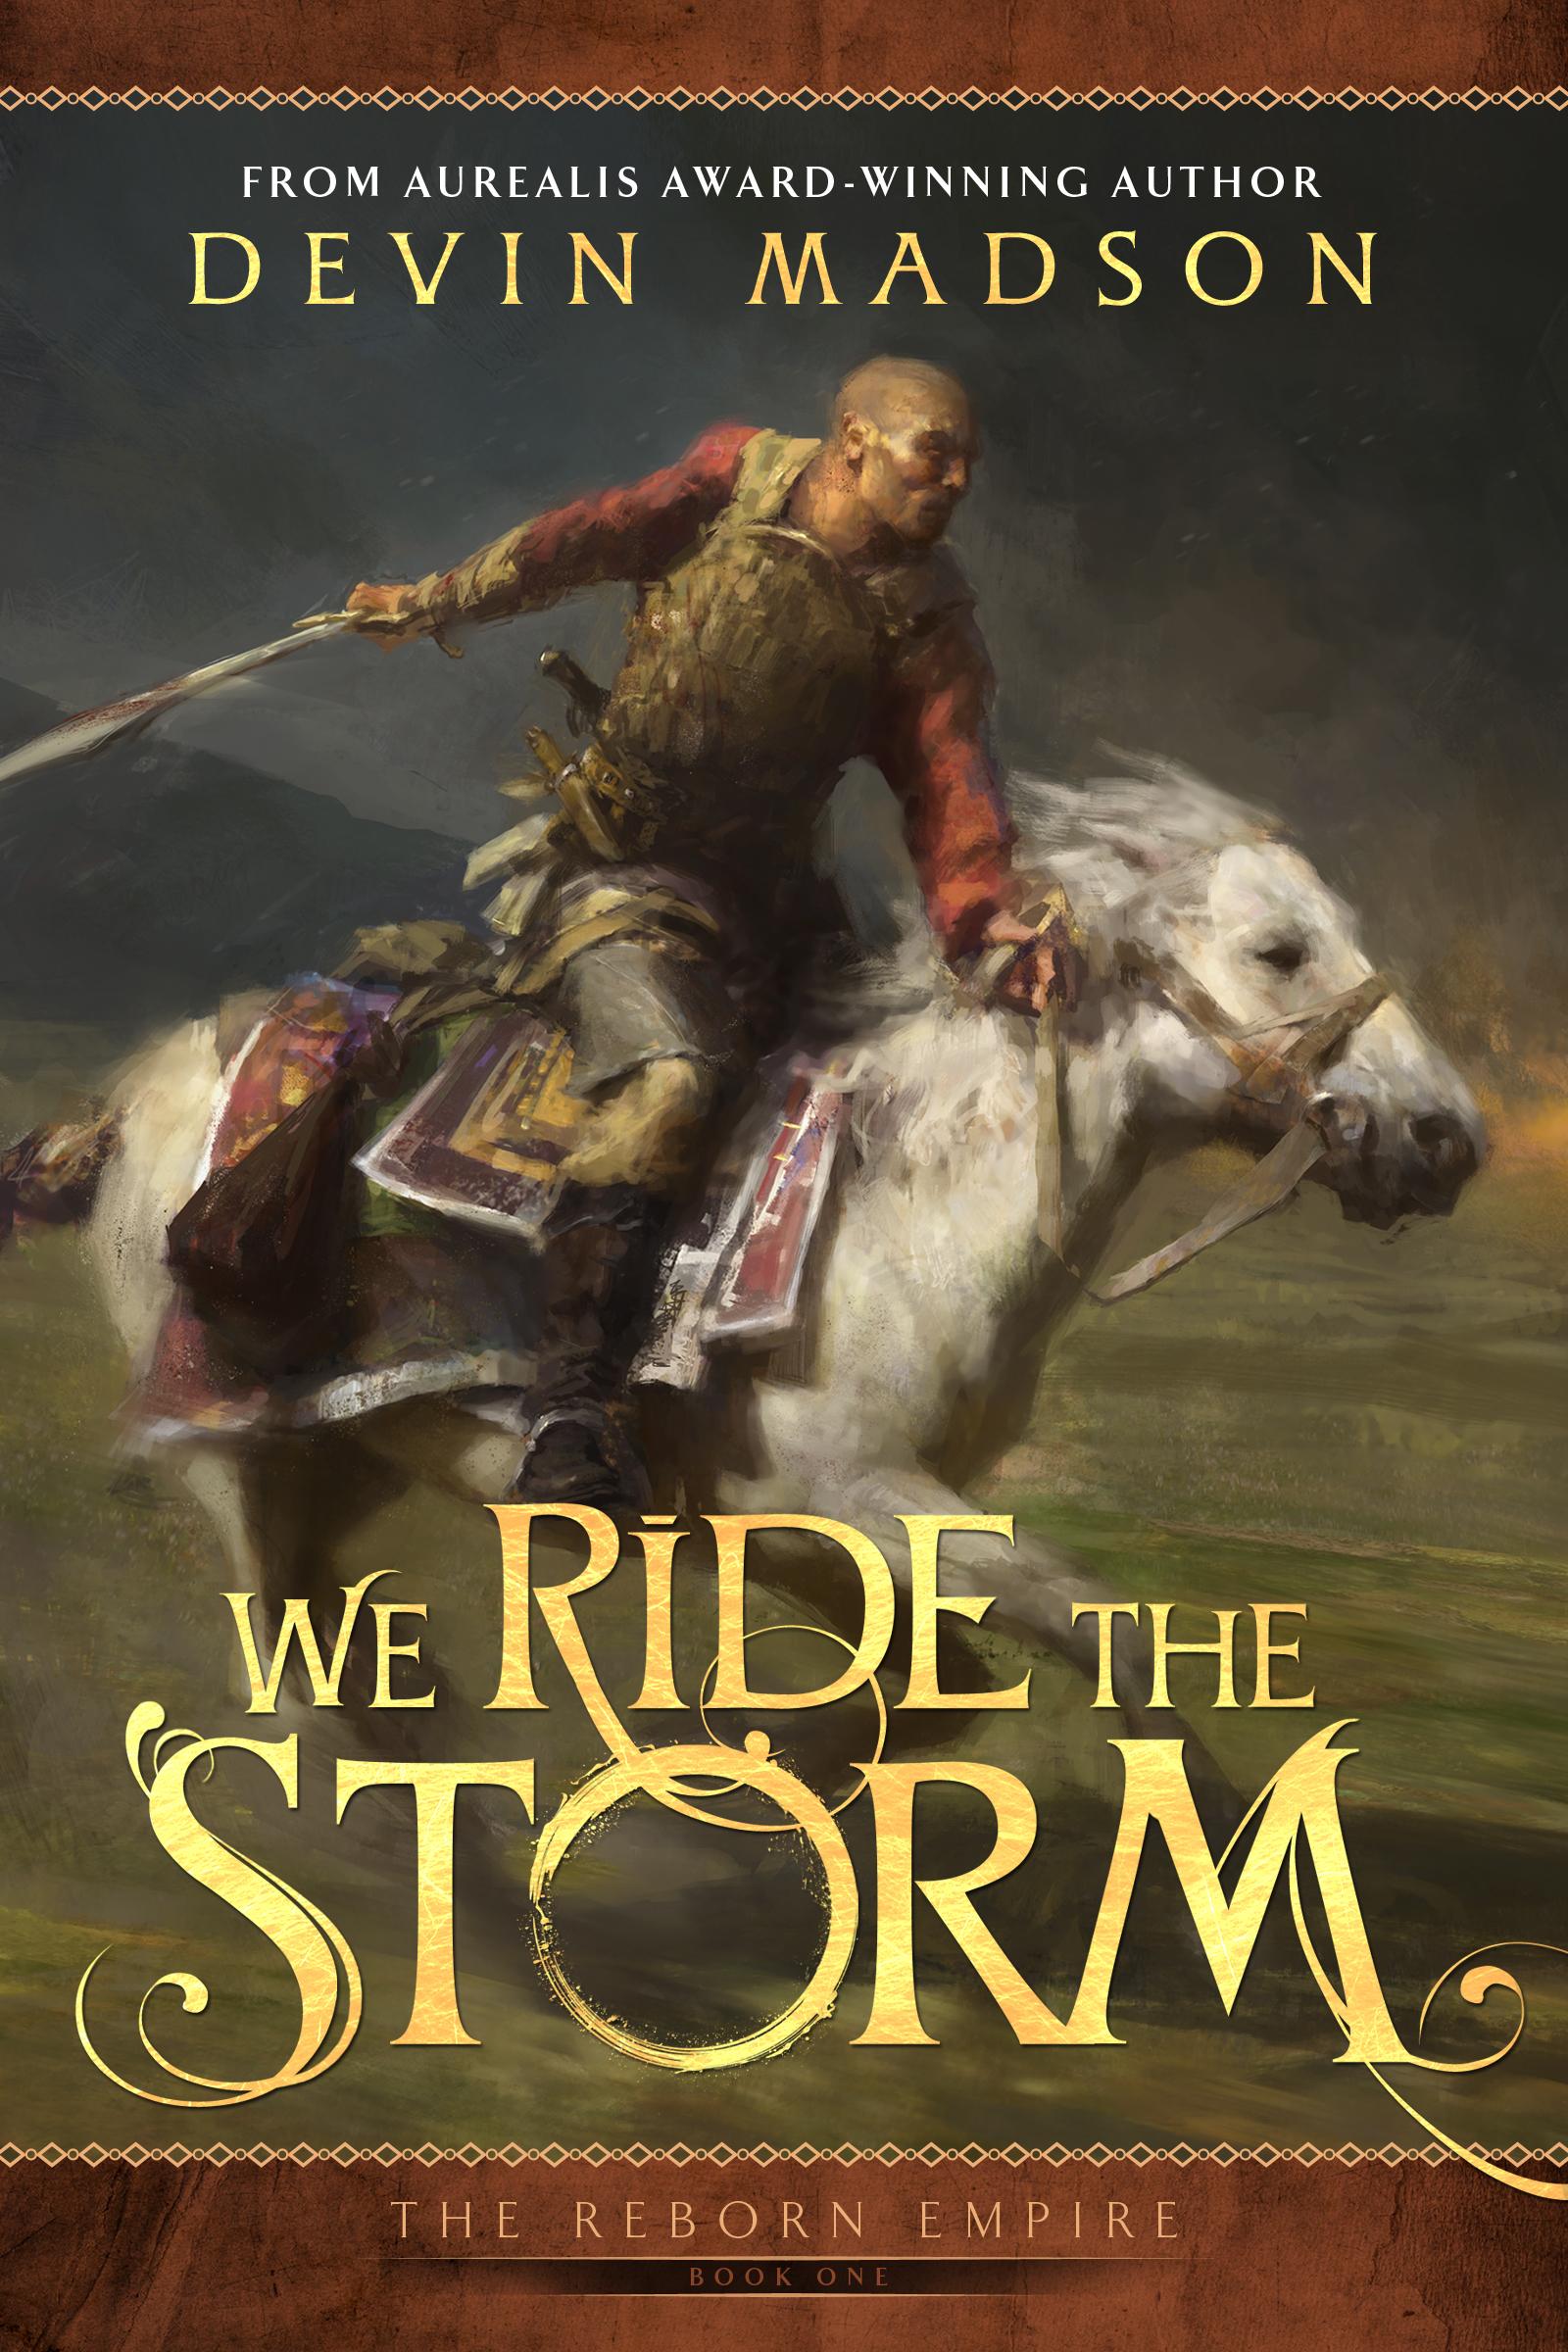 A Storm of Chaos (The Colliding Empires Book 1)